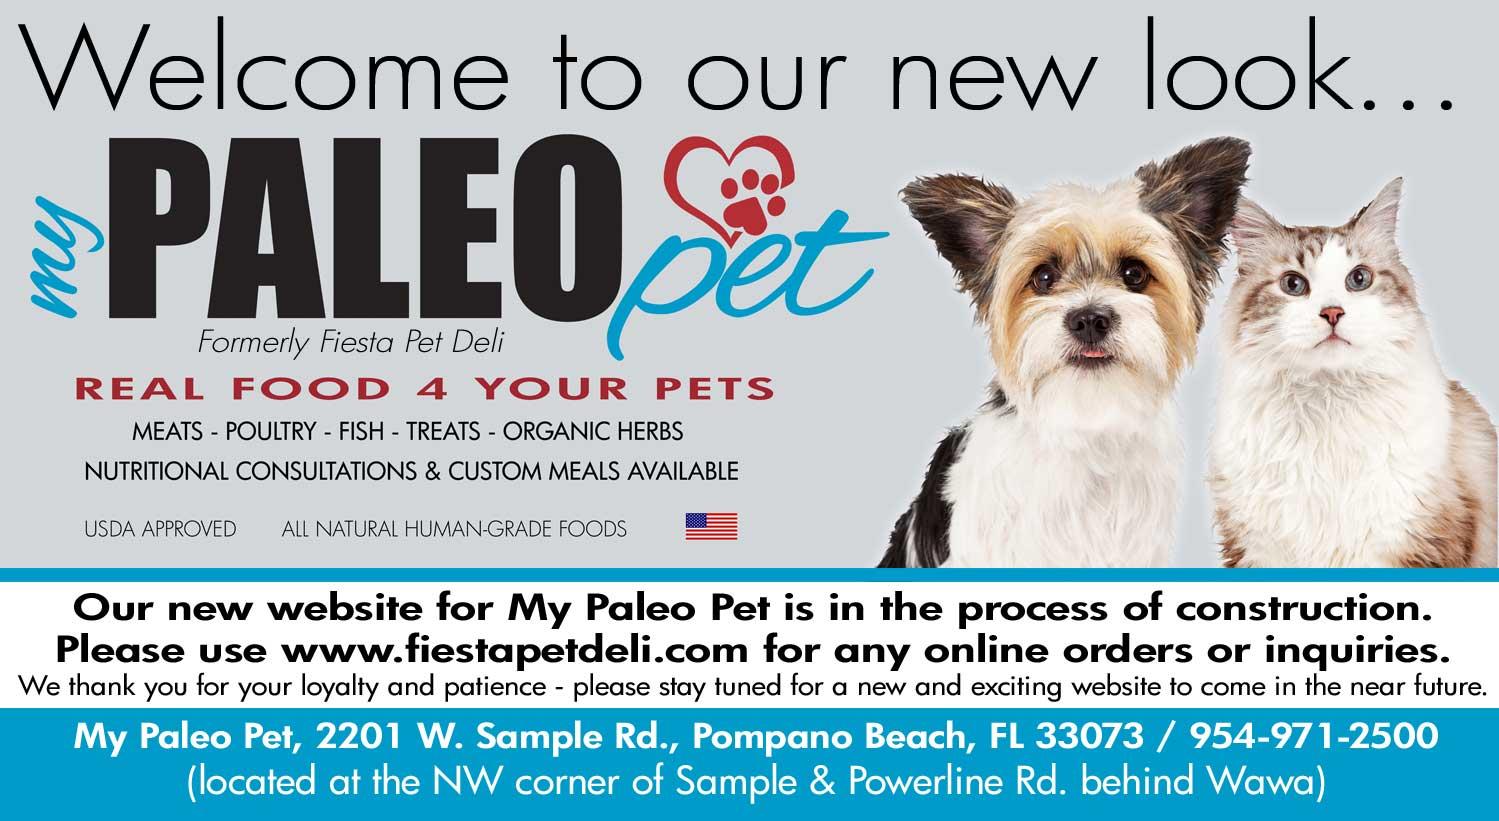 NEW LOCATION: 2201 W. Sample Rd., Bldg. 8, Suite 5A, Pompano Beach, FL  /  954-971-2500